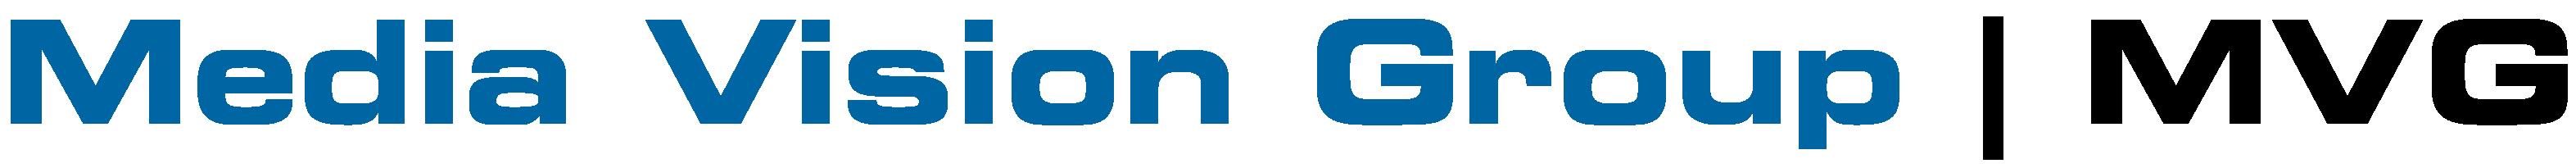 Media Vision Group